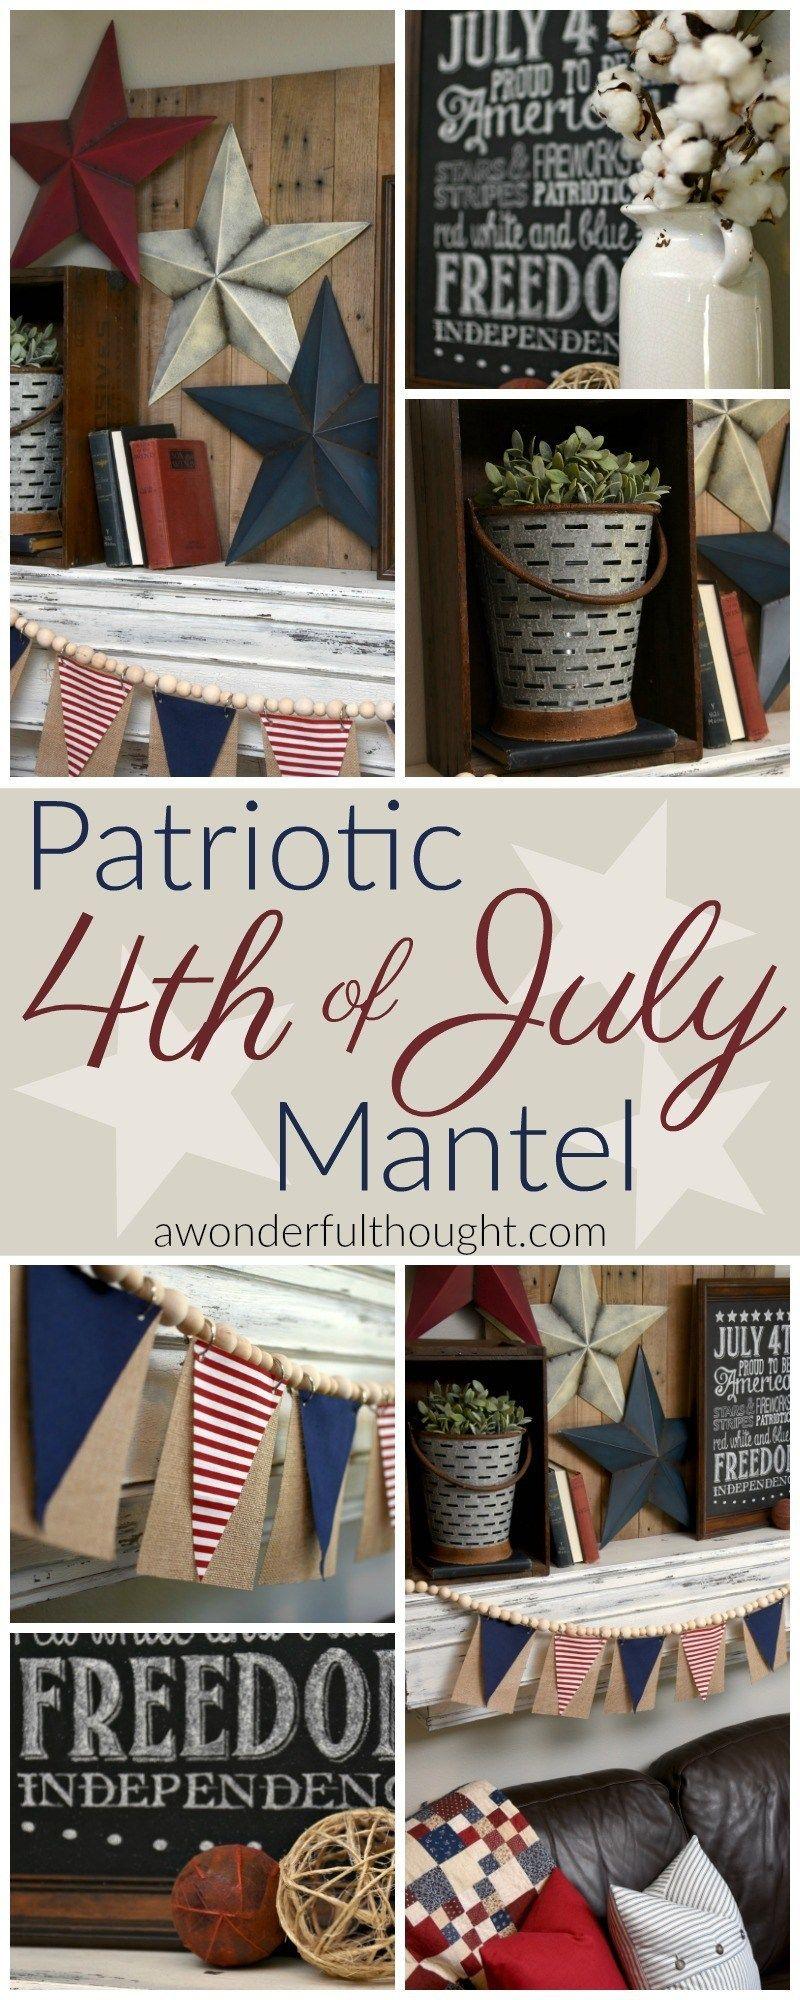 Patriotic 4th of July Mantel #holidaysinjuly